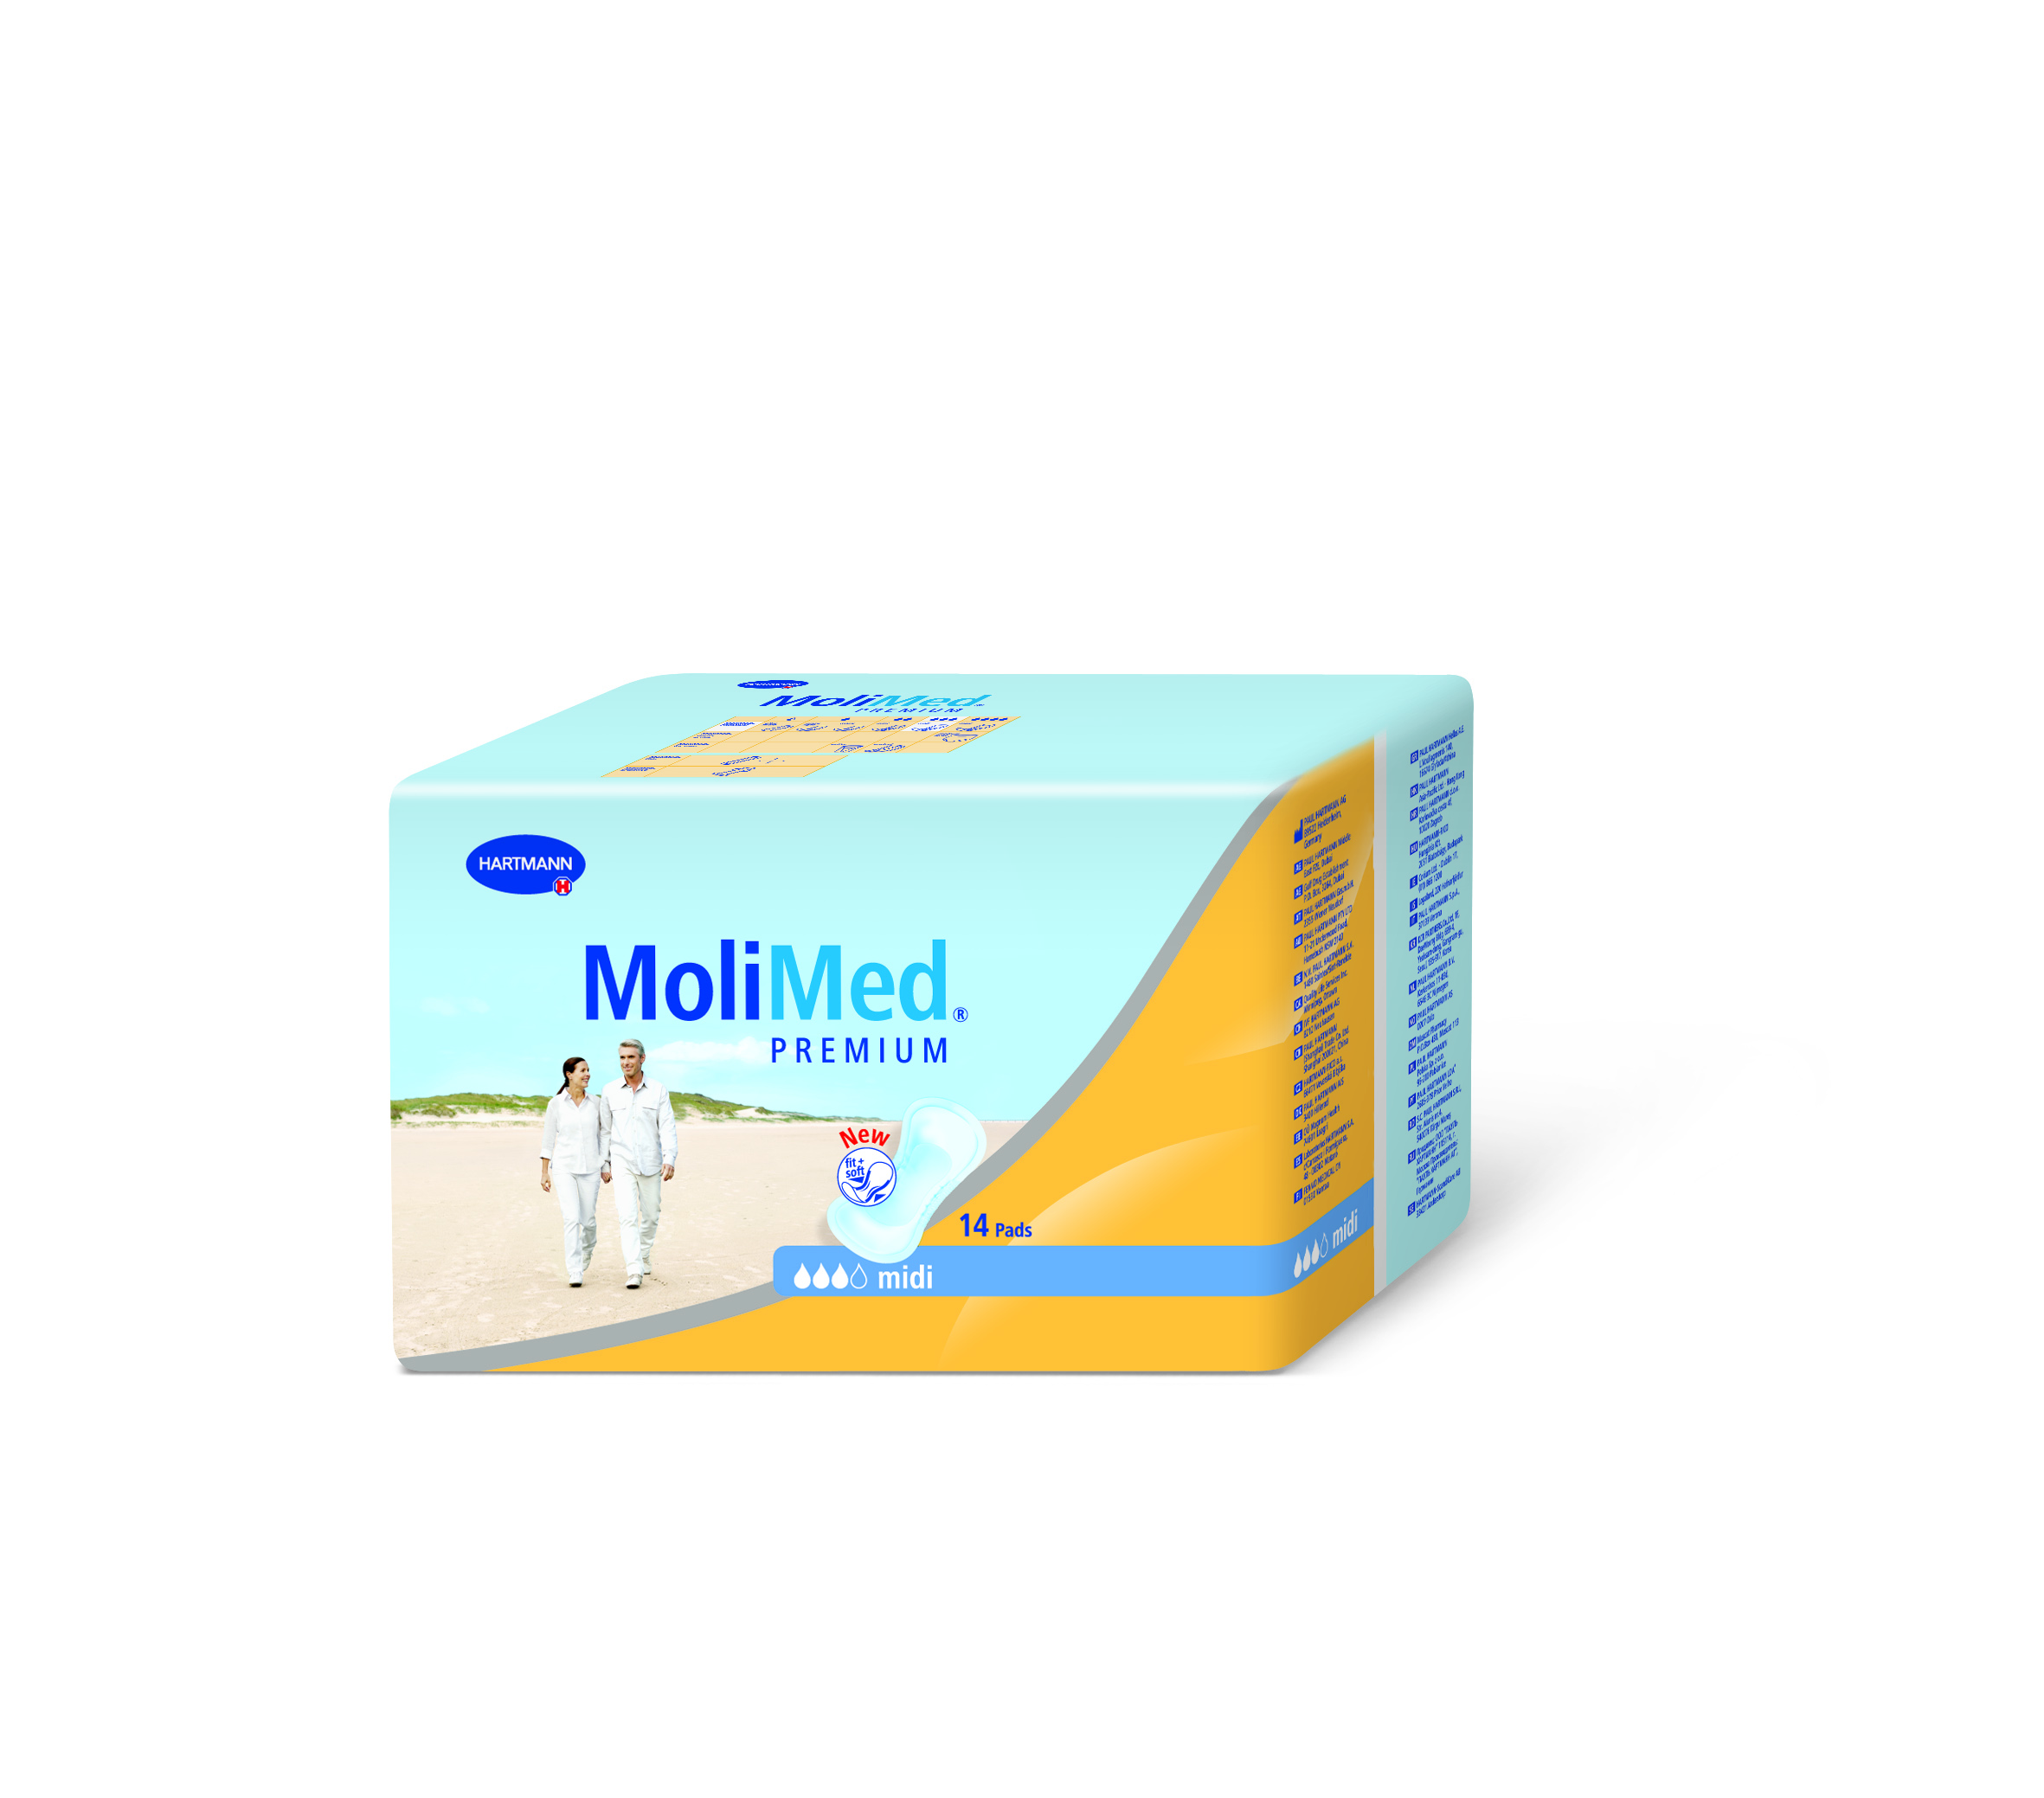 MoliMed Premium Midi - 3D